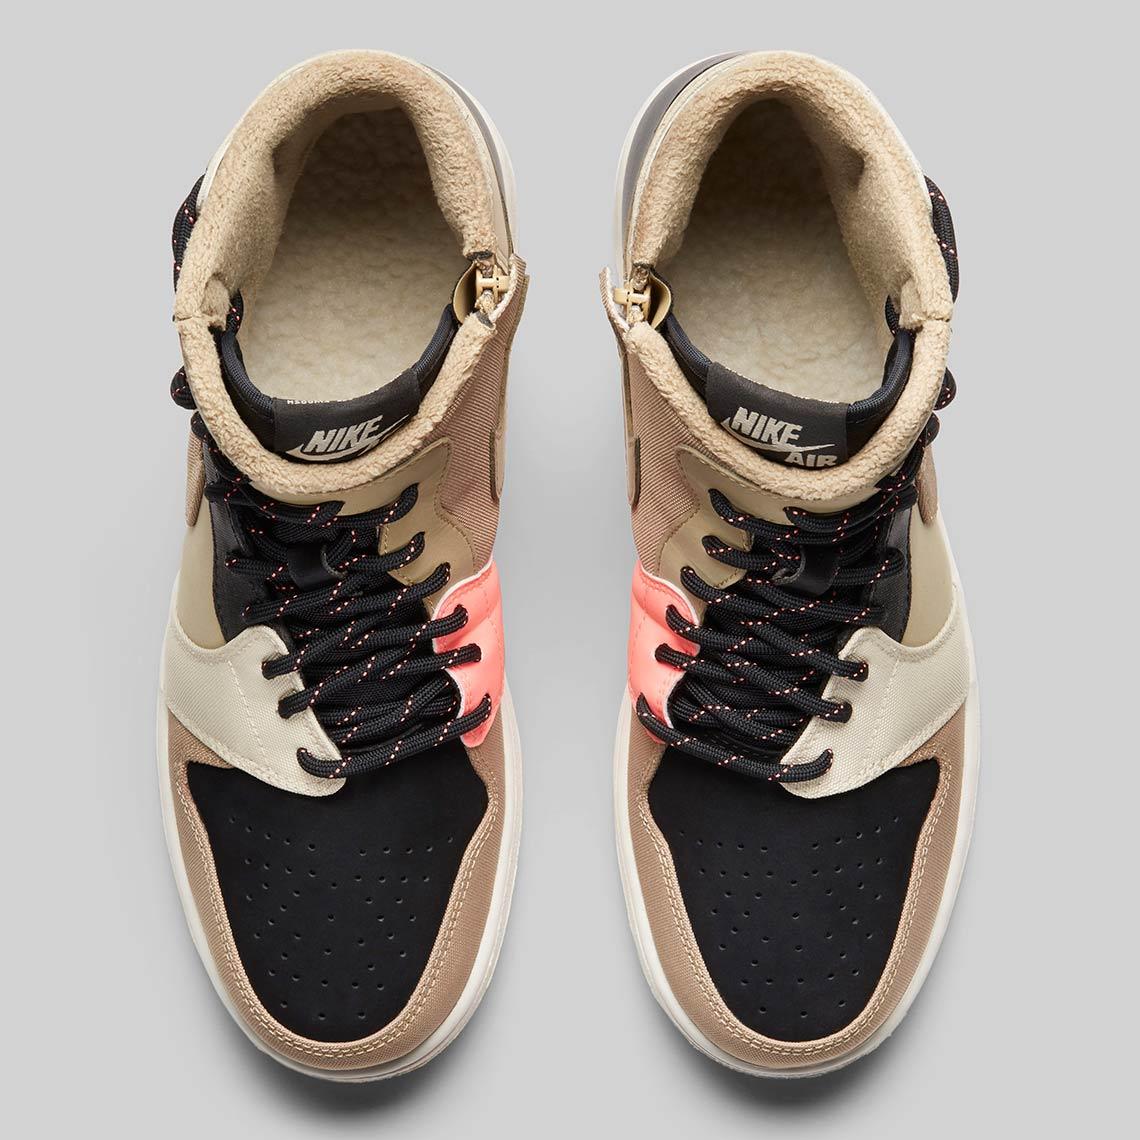 141b67ef37c802 Air Jordan 1 Utility Pack Womens Release Info